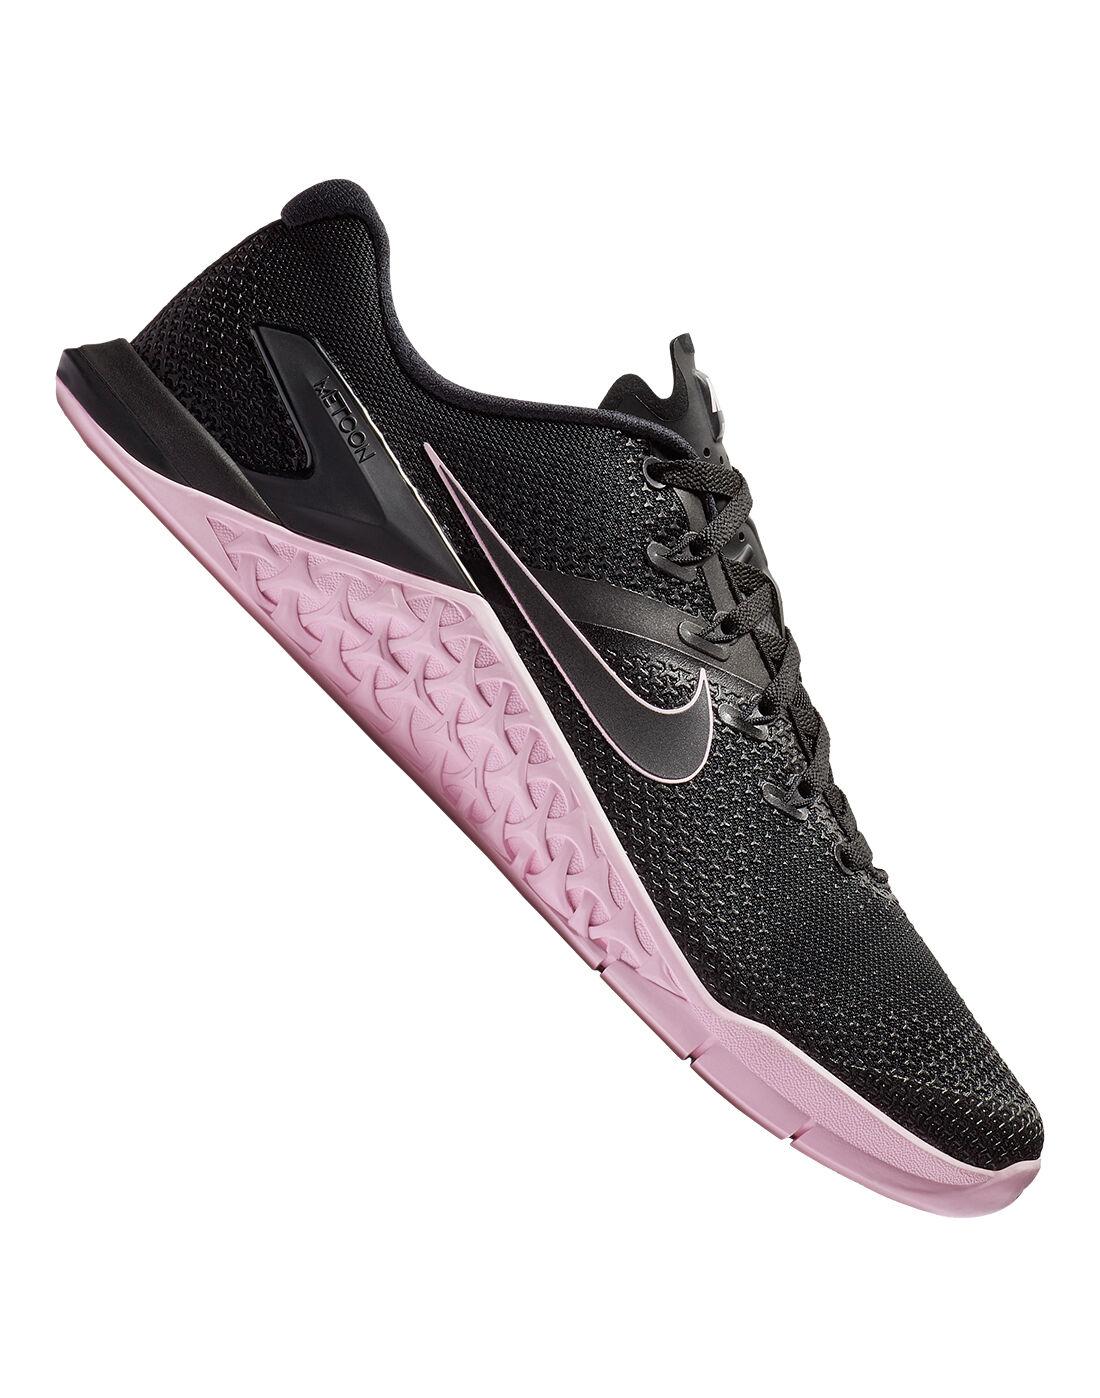 Men's Black Nike Metcon 4 Gym Shoes